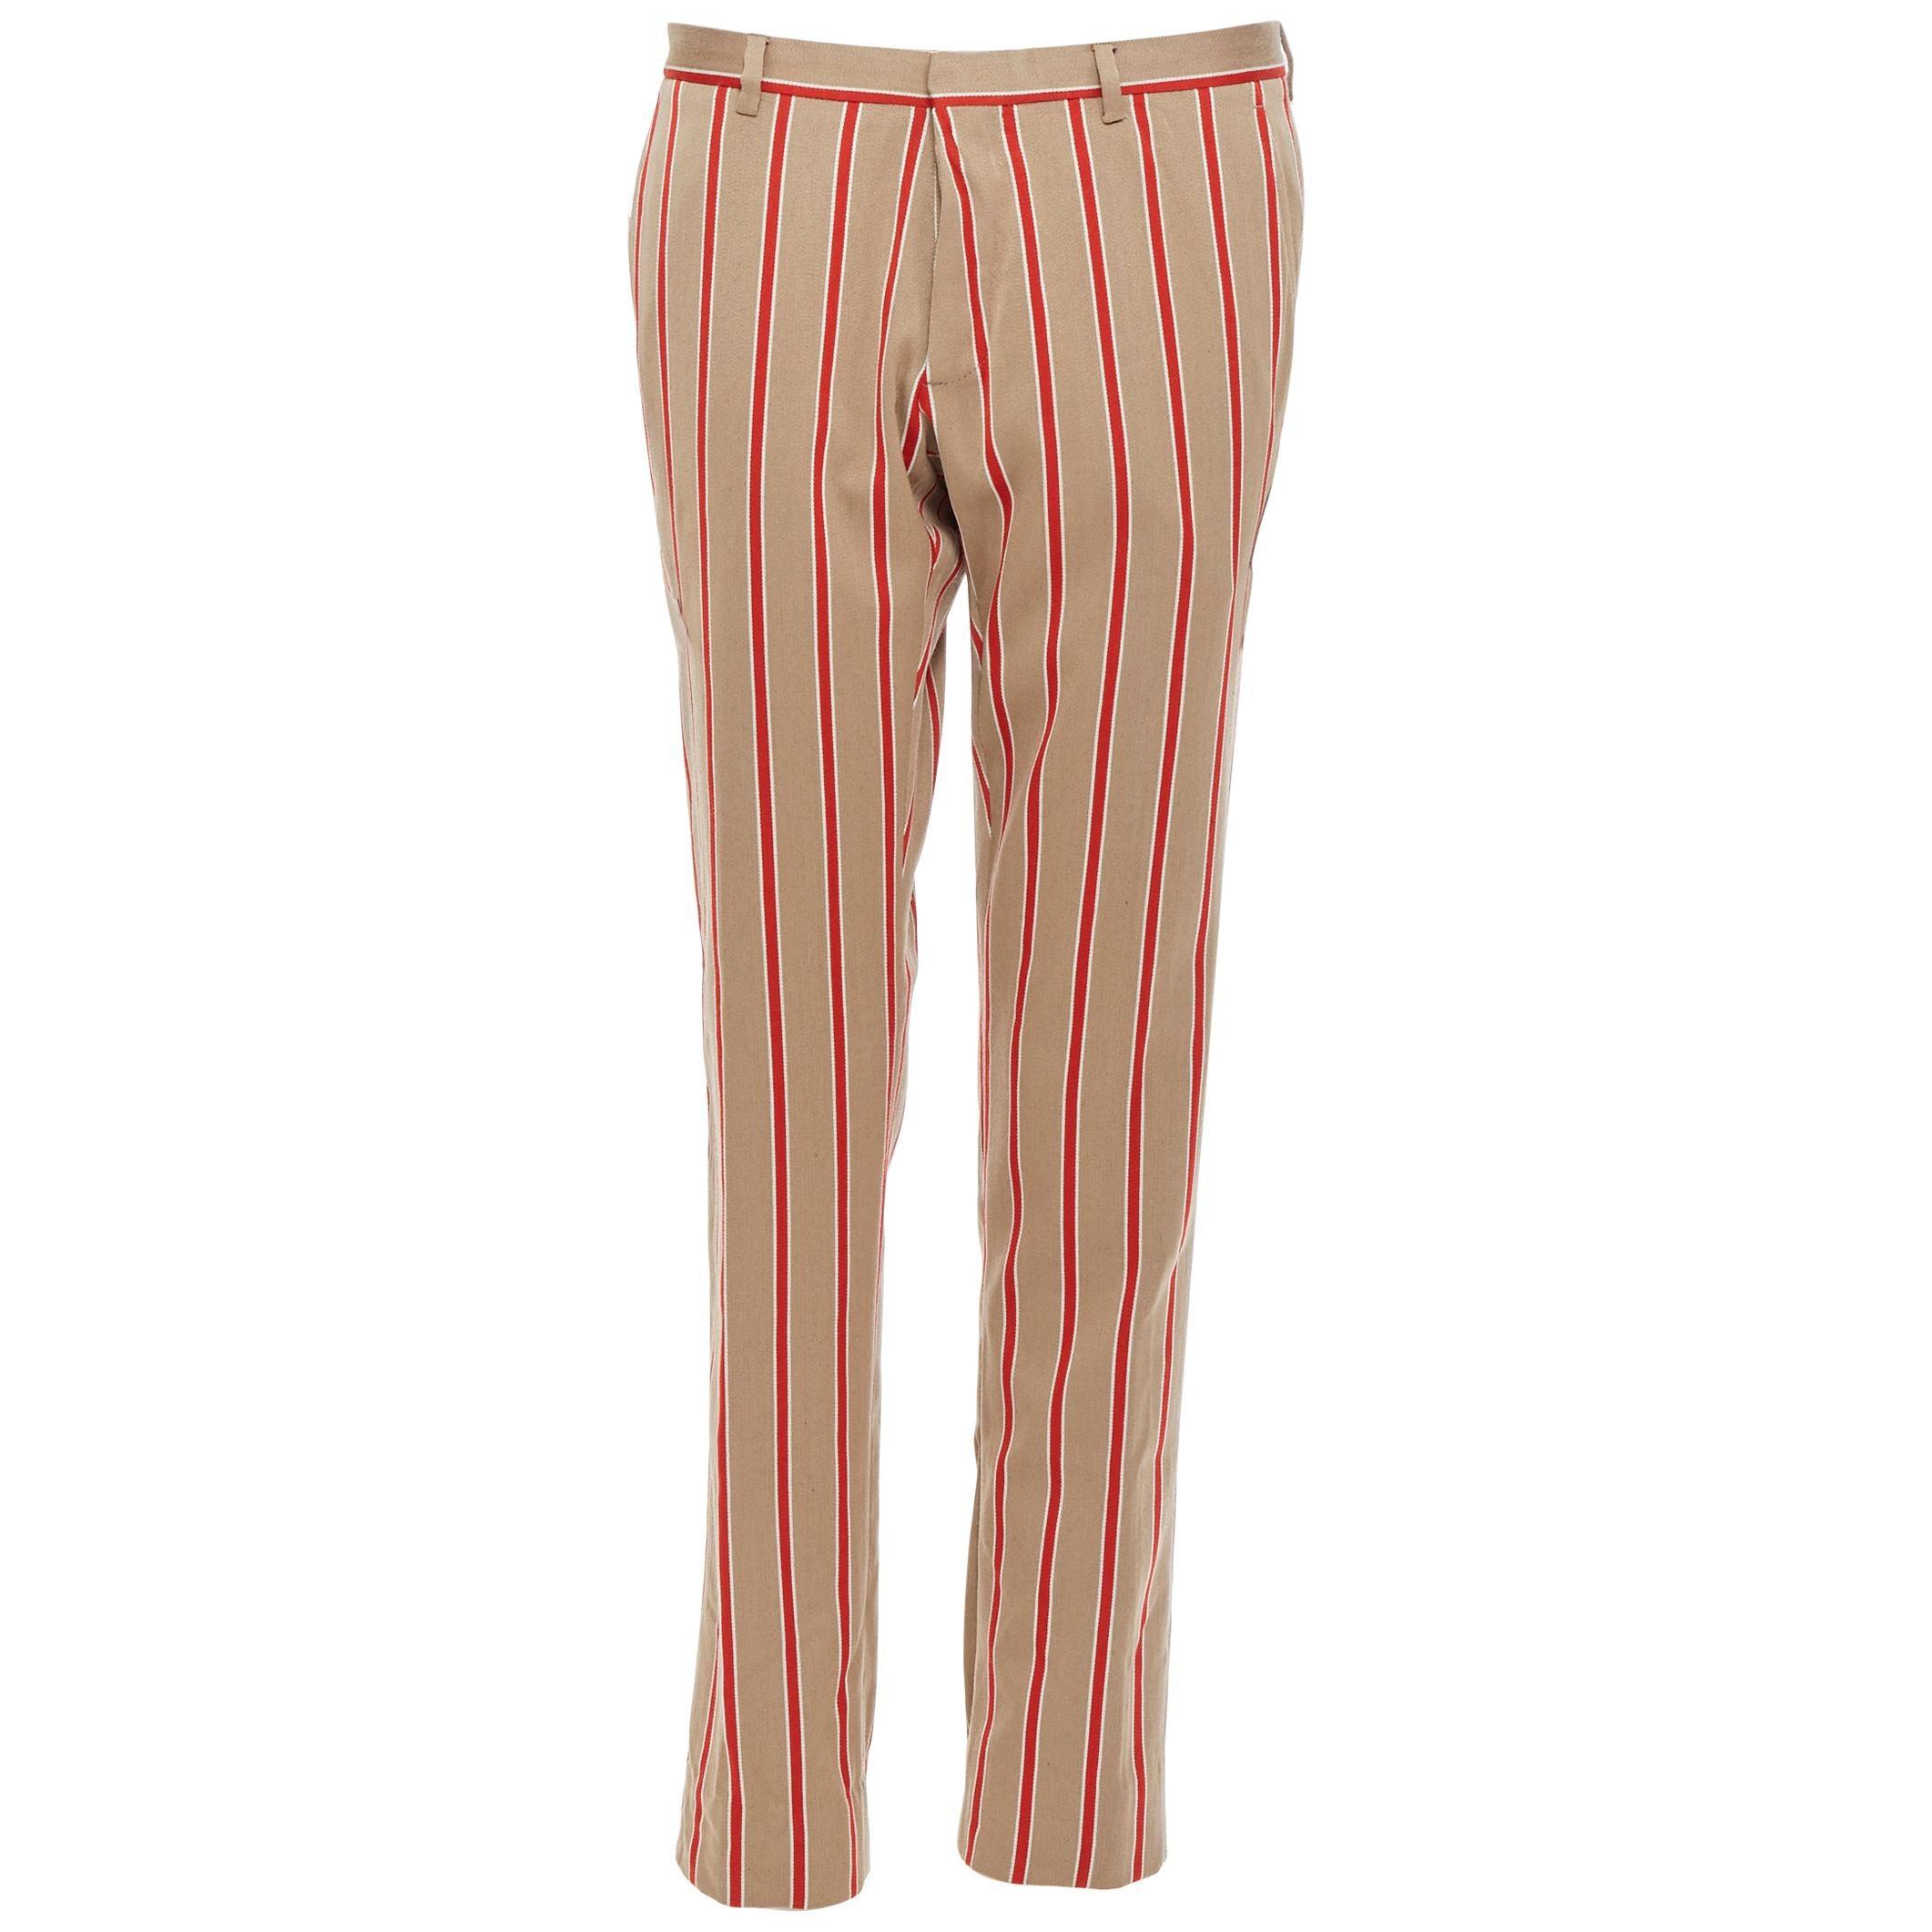 ROMEO GIGLI X JOYCE wool cotton beige brown red stripe vertical trousers IT46